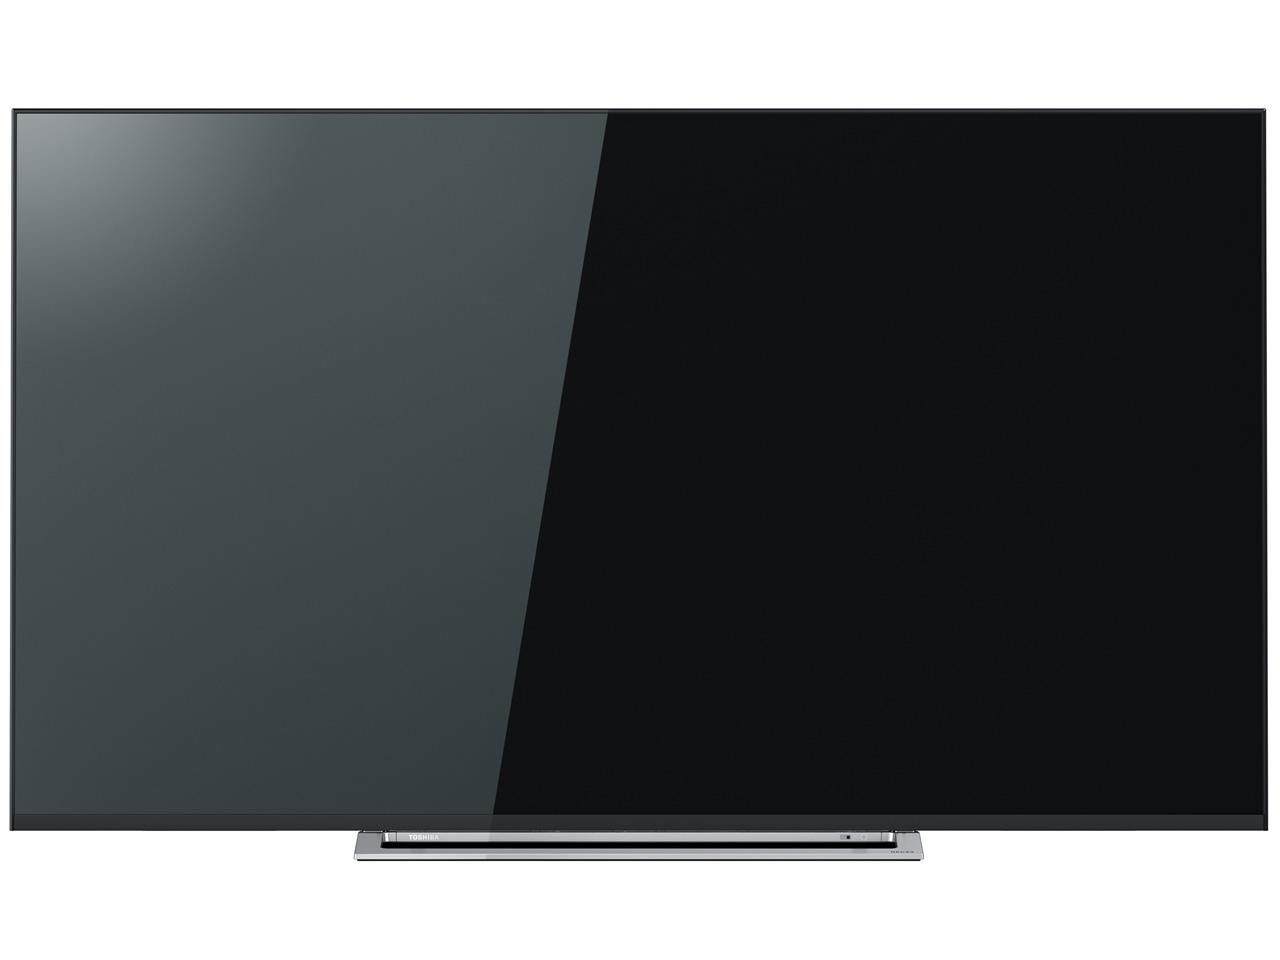 REGZA 65M520X [65インチ] の製品画像